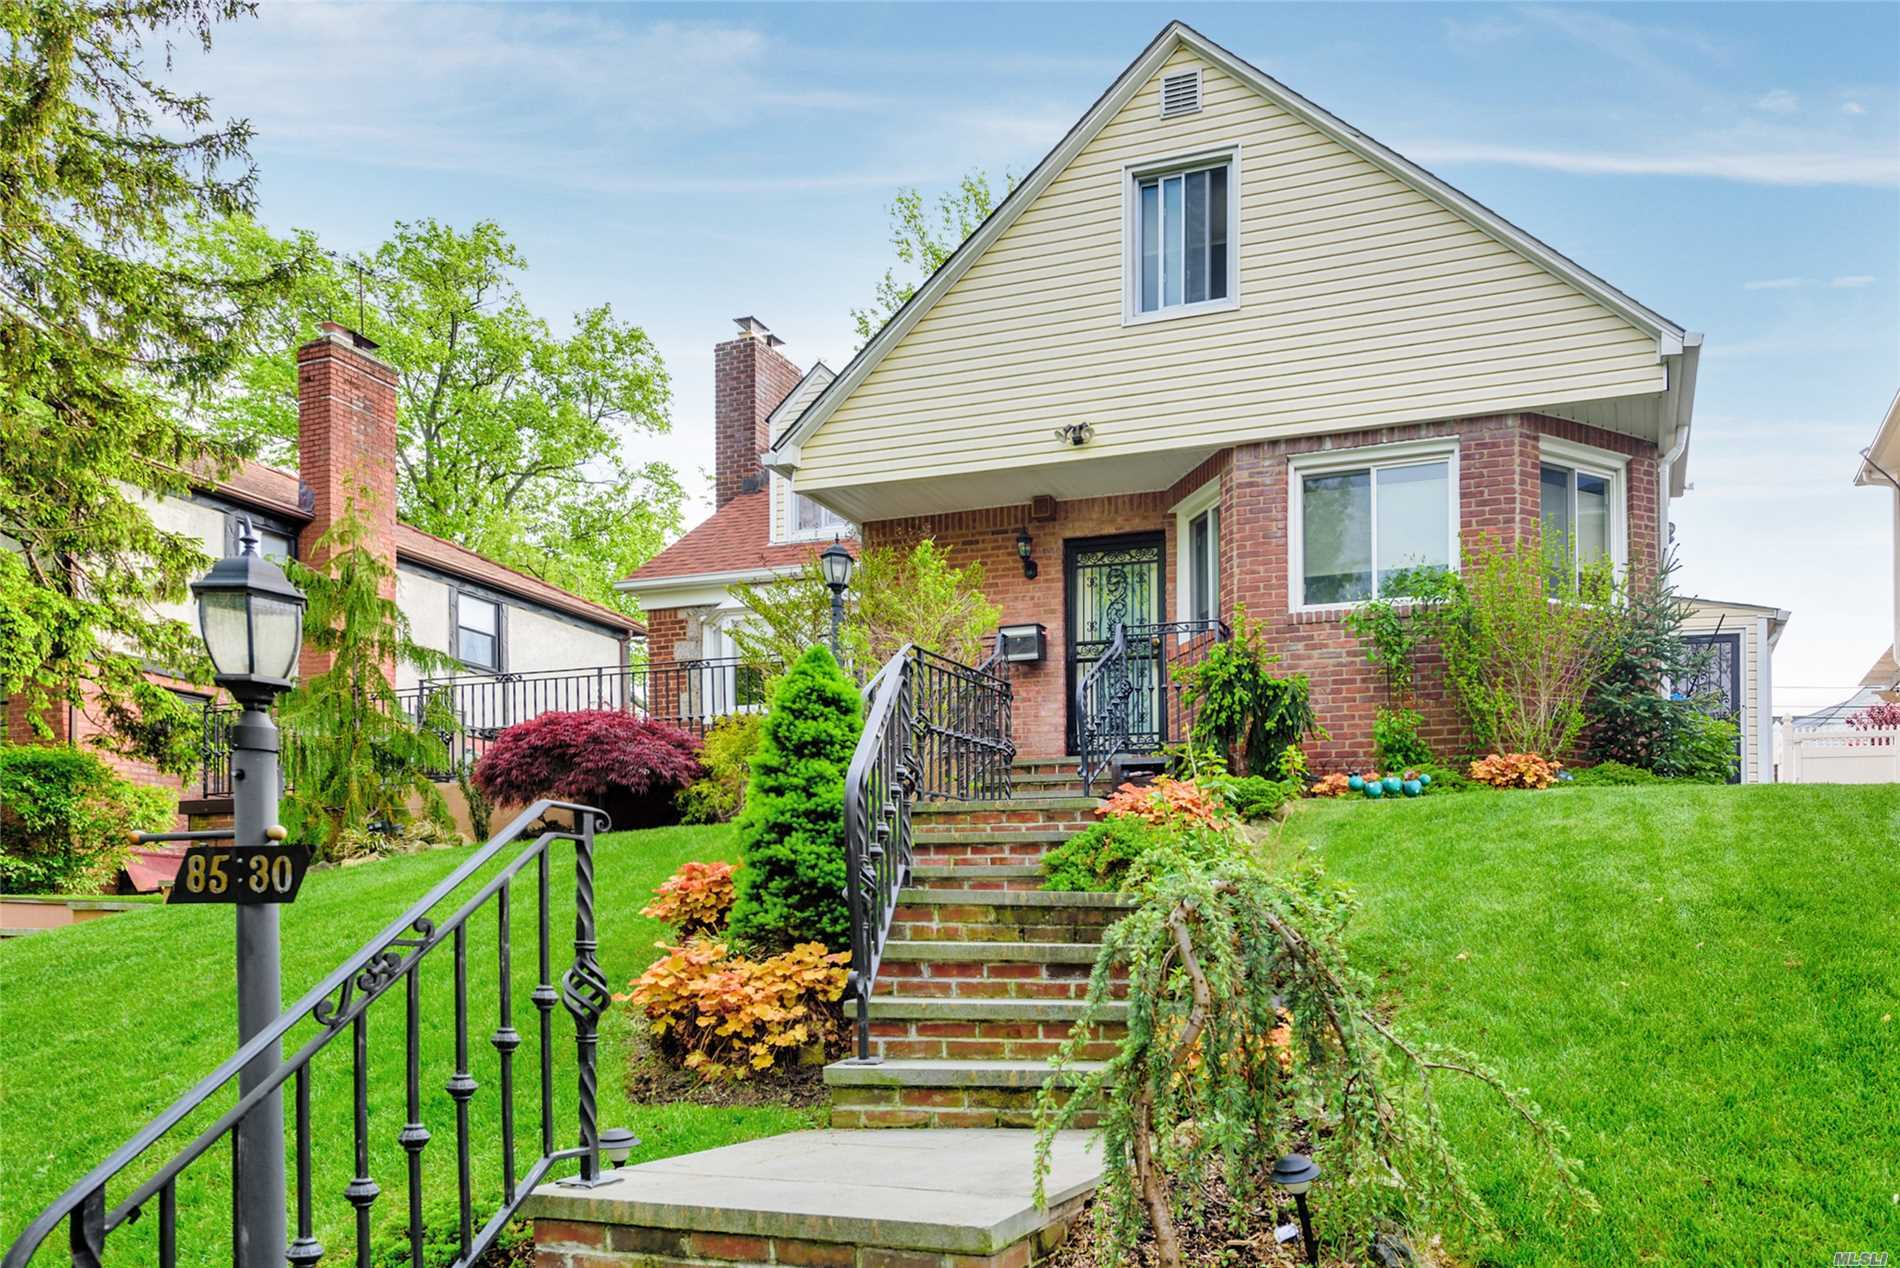 85-30 217 St - Hollis Hills, New York